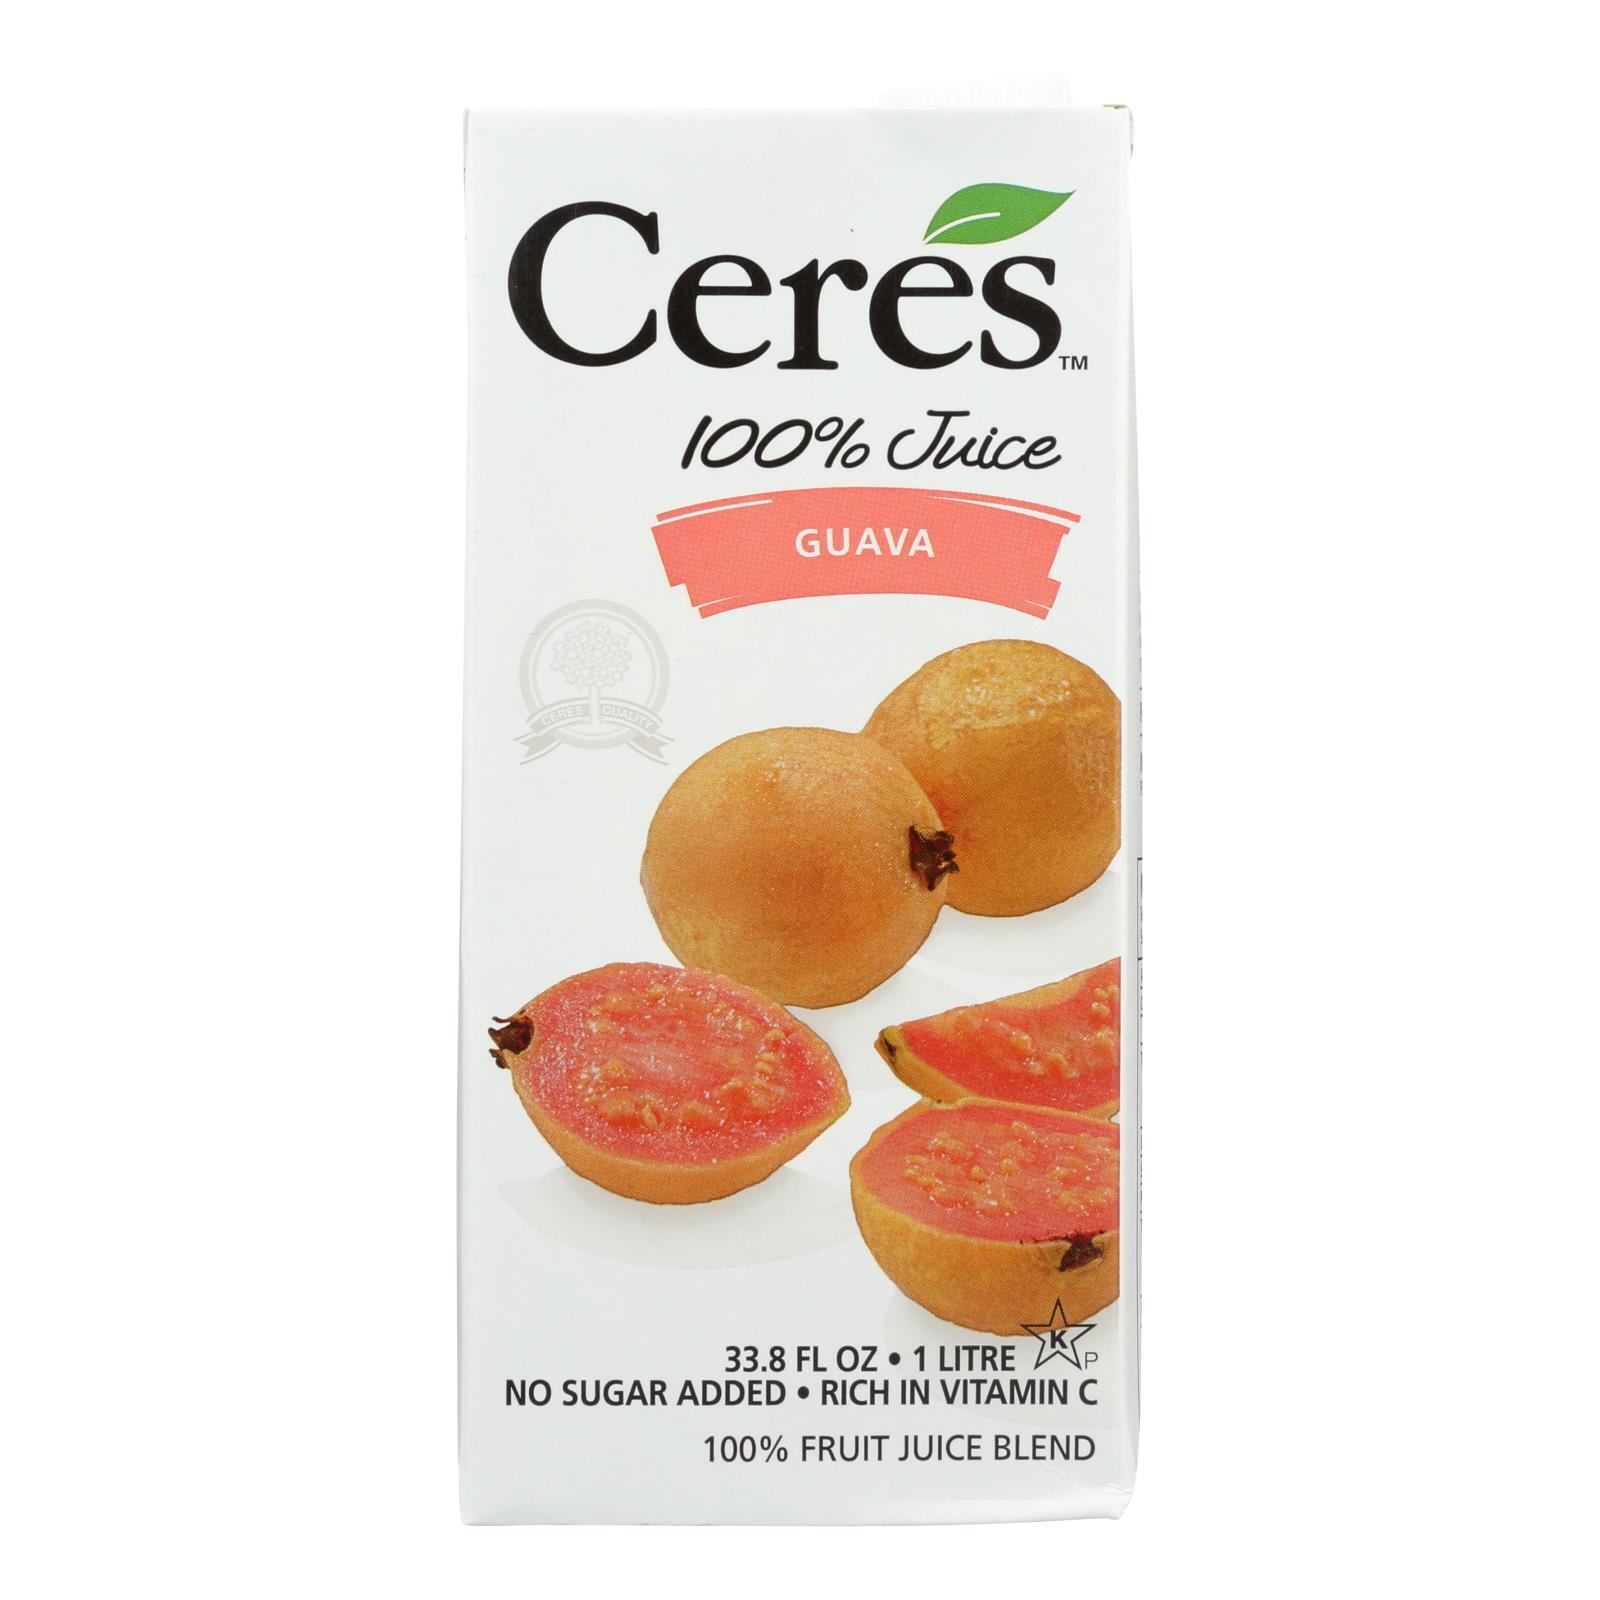 Ceres Juices Juice - Guava - Case of 12 - 33.8 fl oz